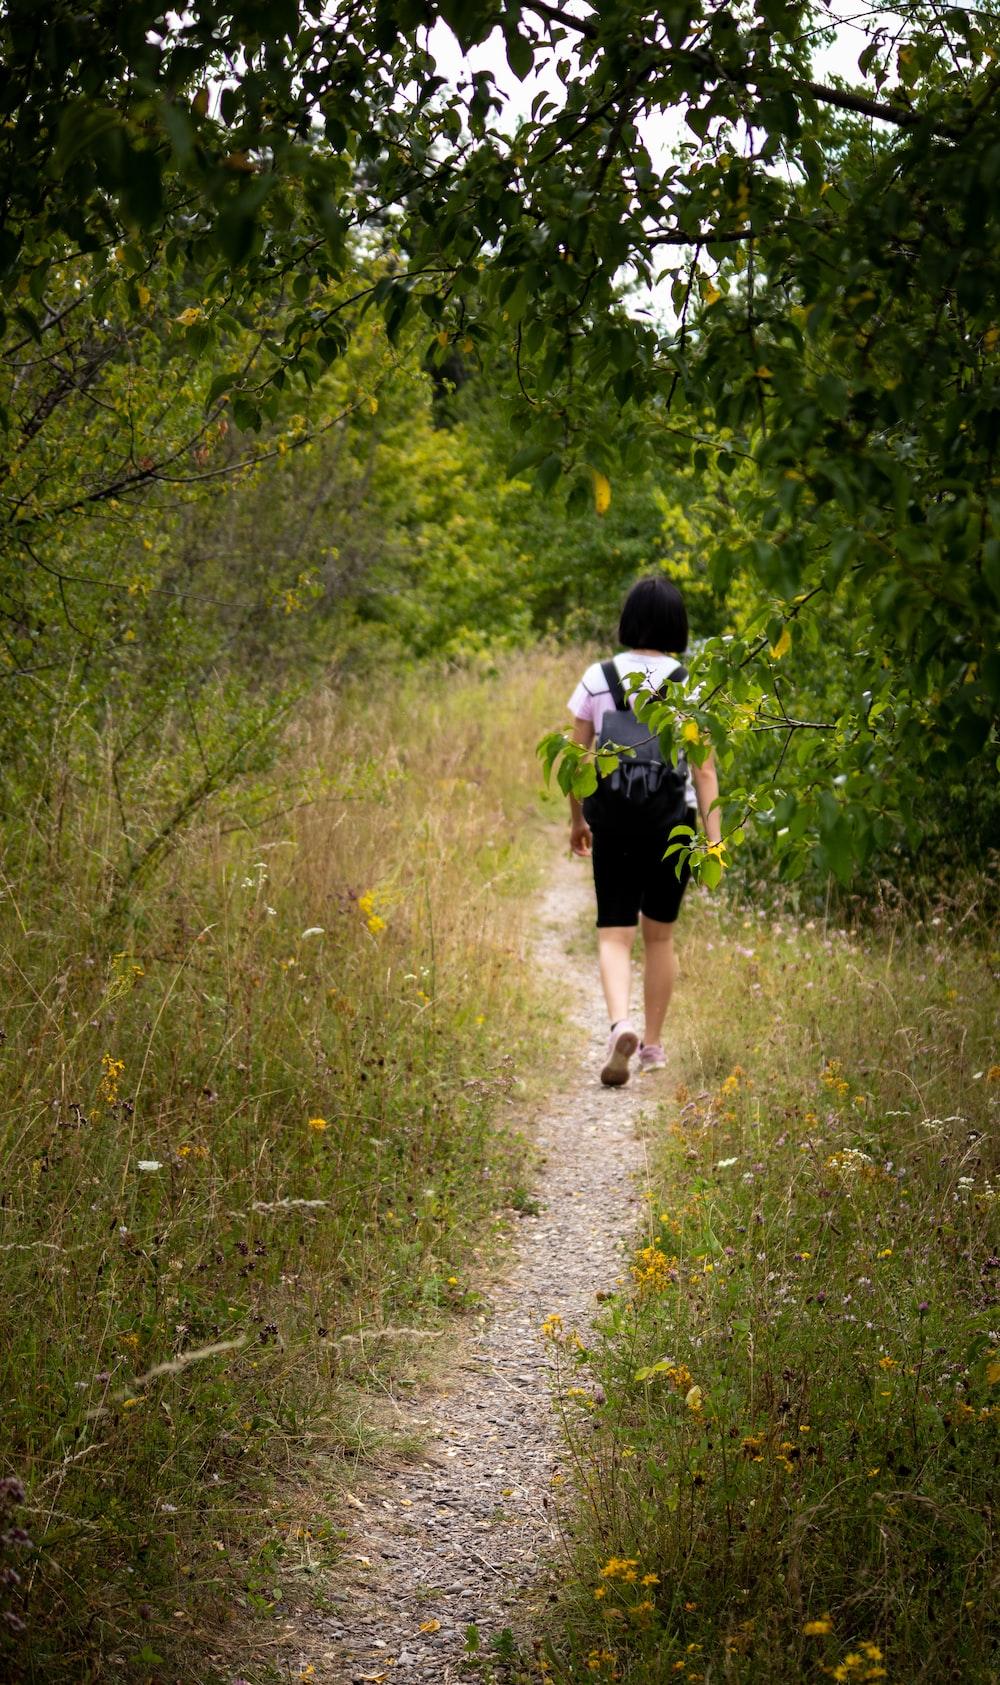 woman in black dress walking on green grass during daytime